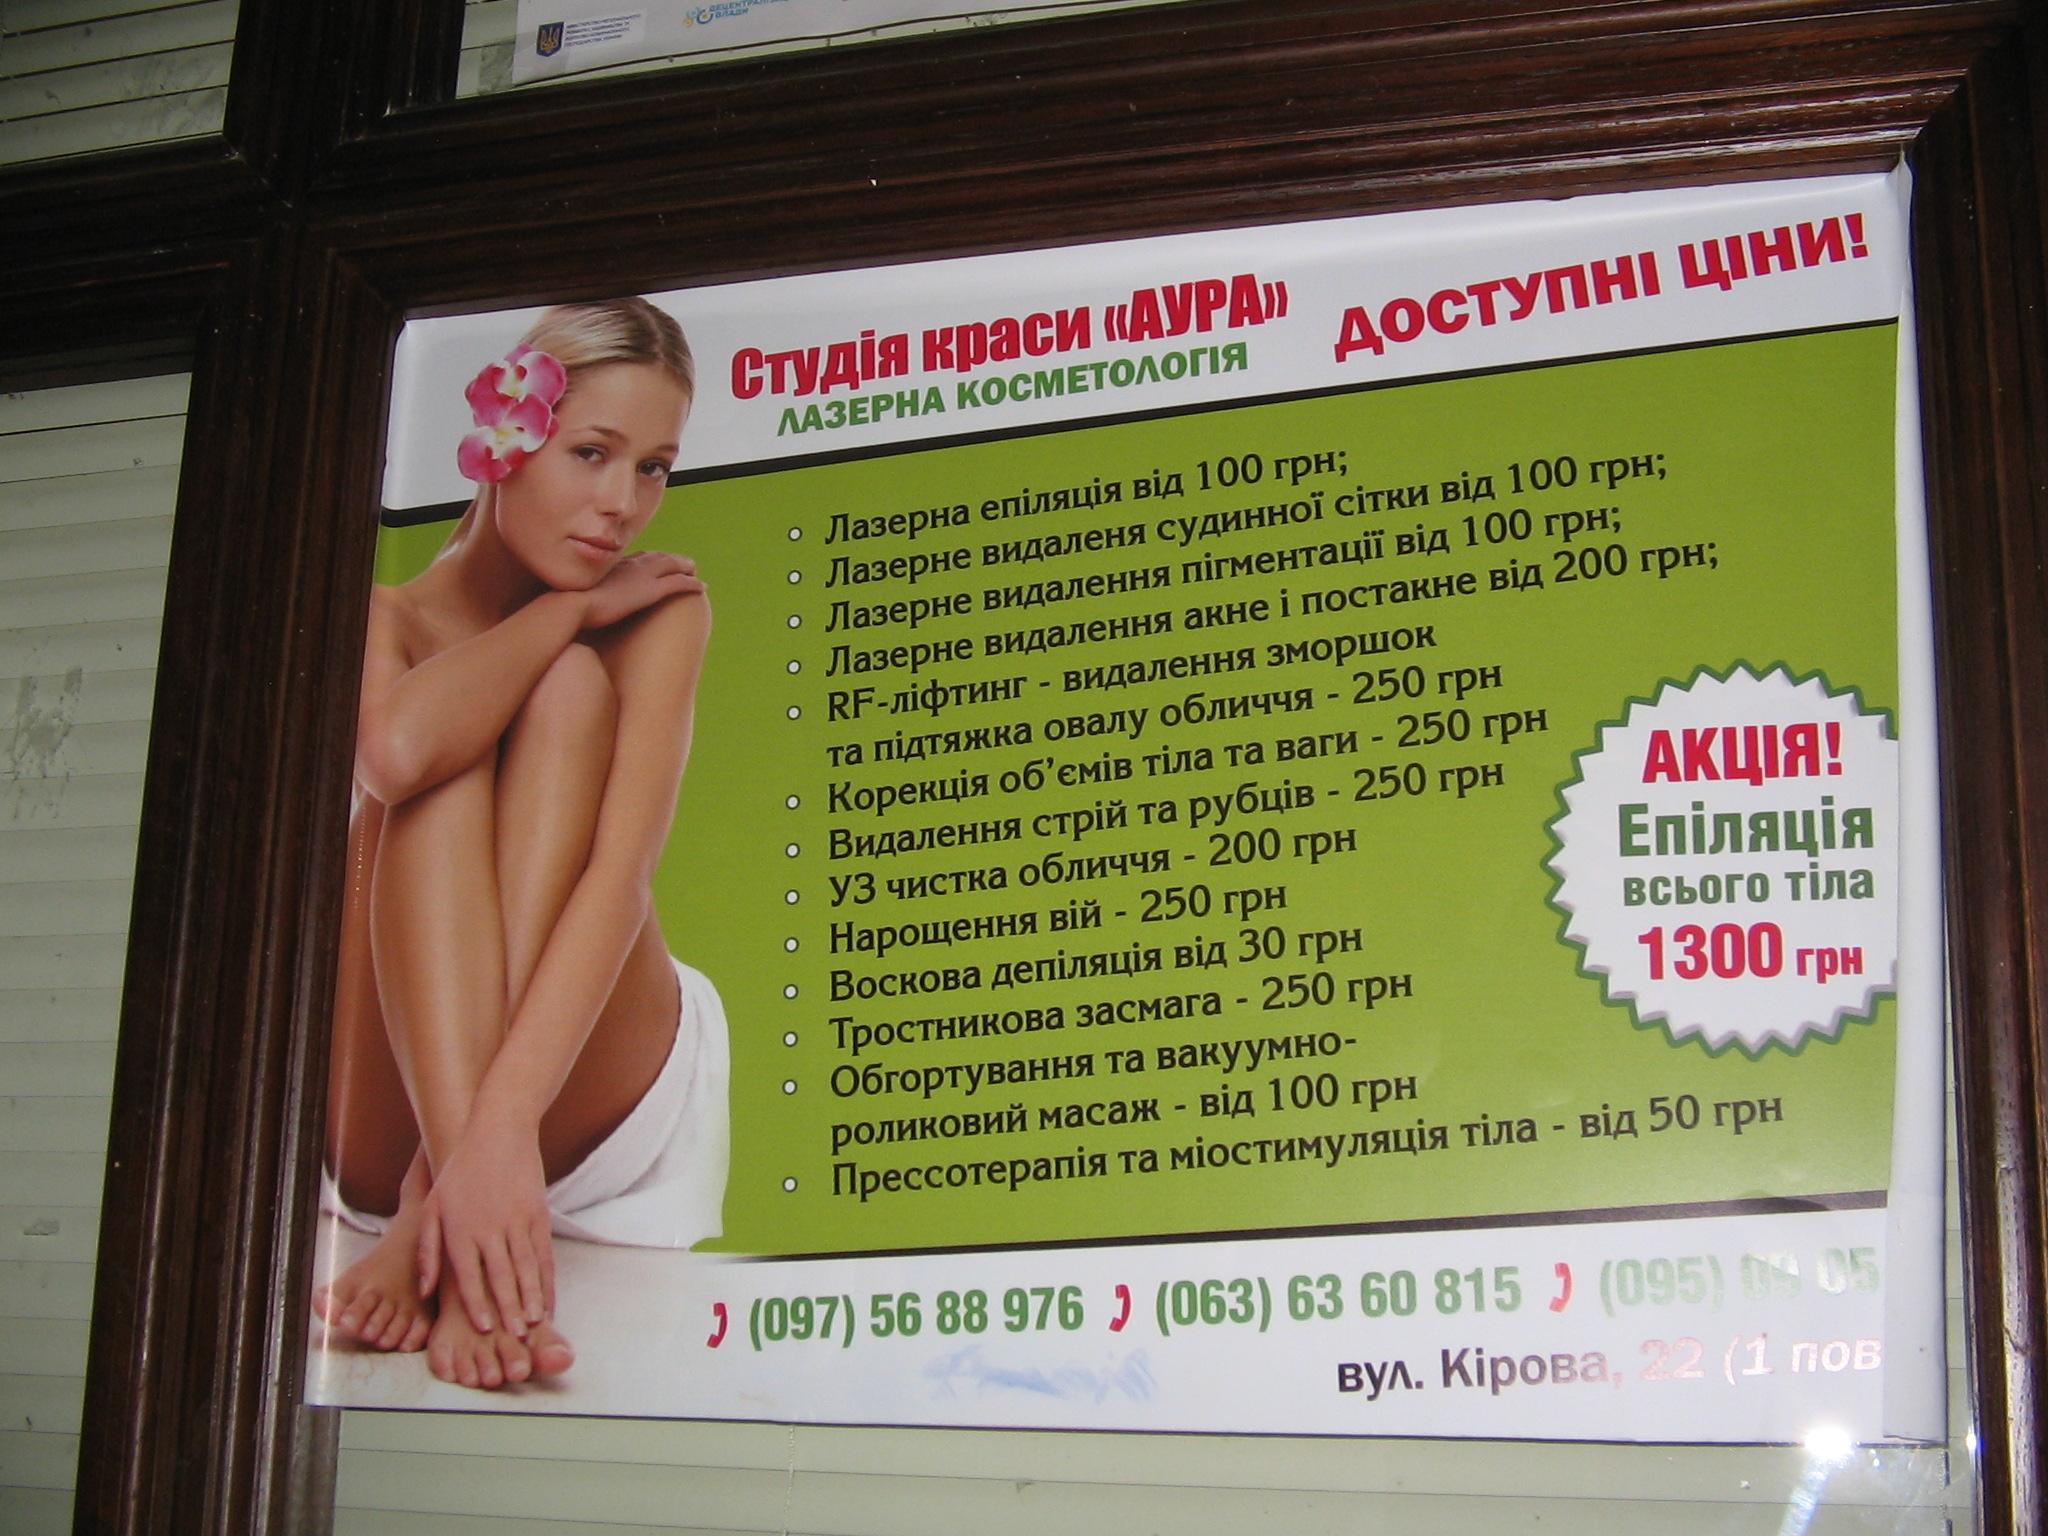 http://s7.uploads.ru/7JWr8.jpg